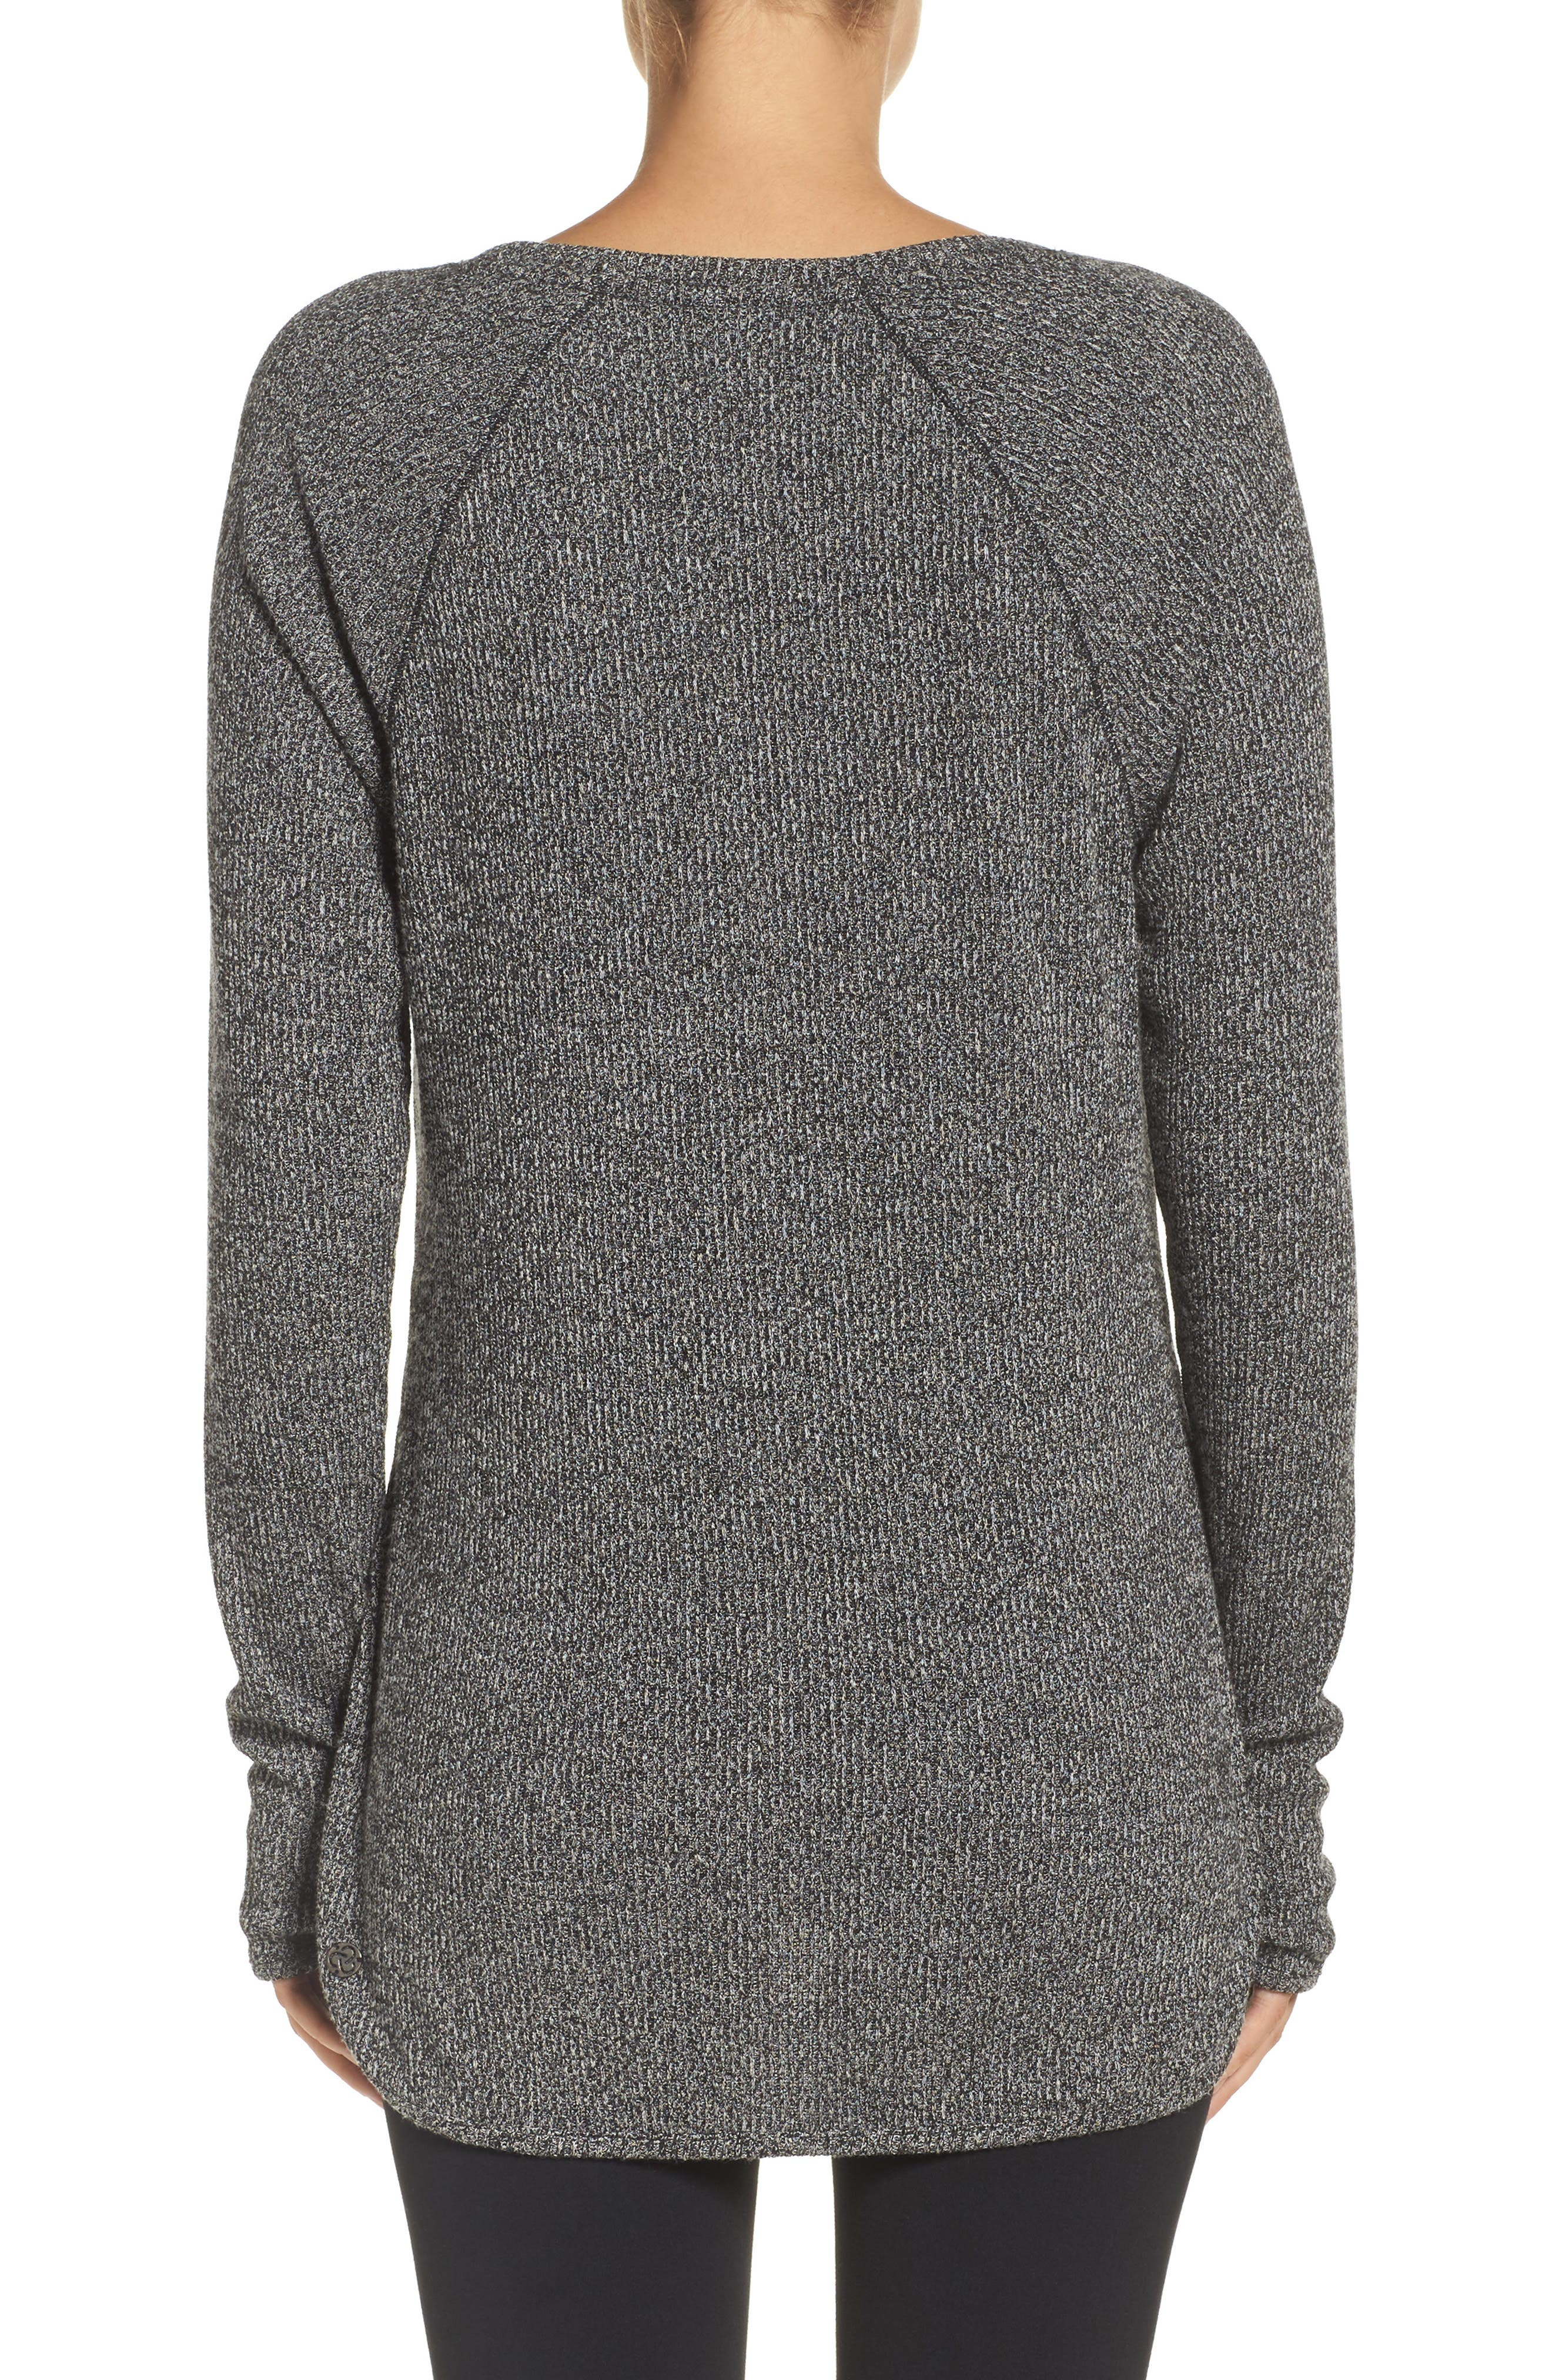 Alternate Image 2  - Zella Don't Sweat It Sweater